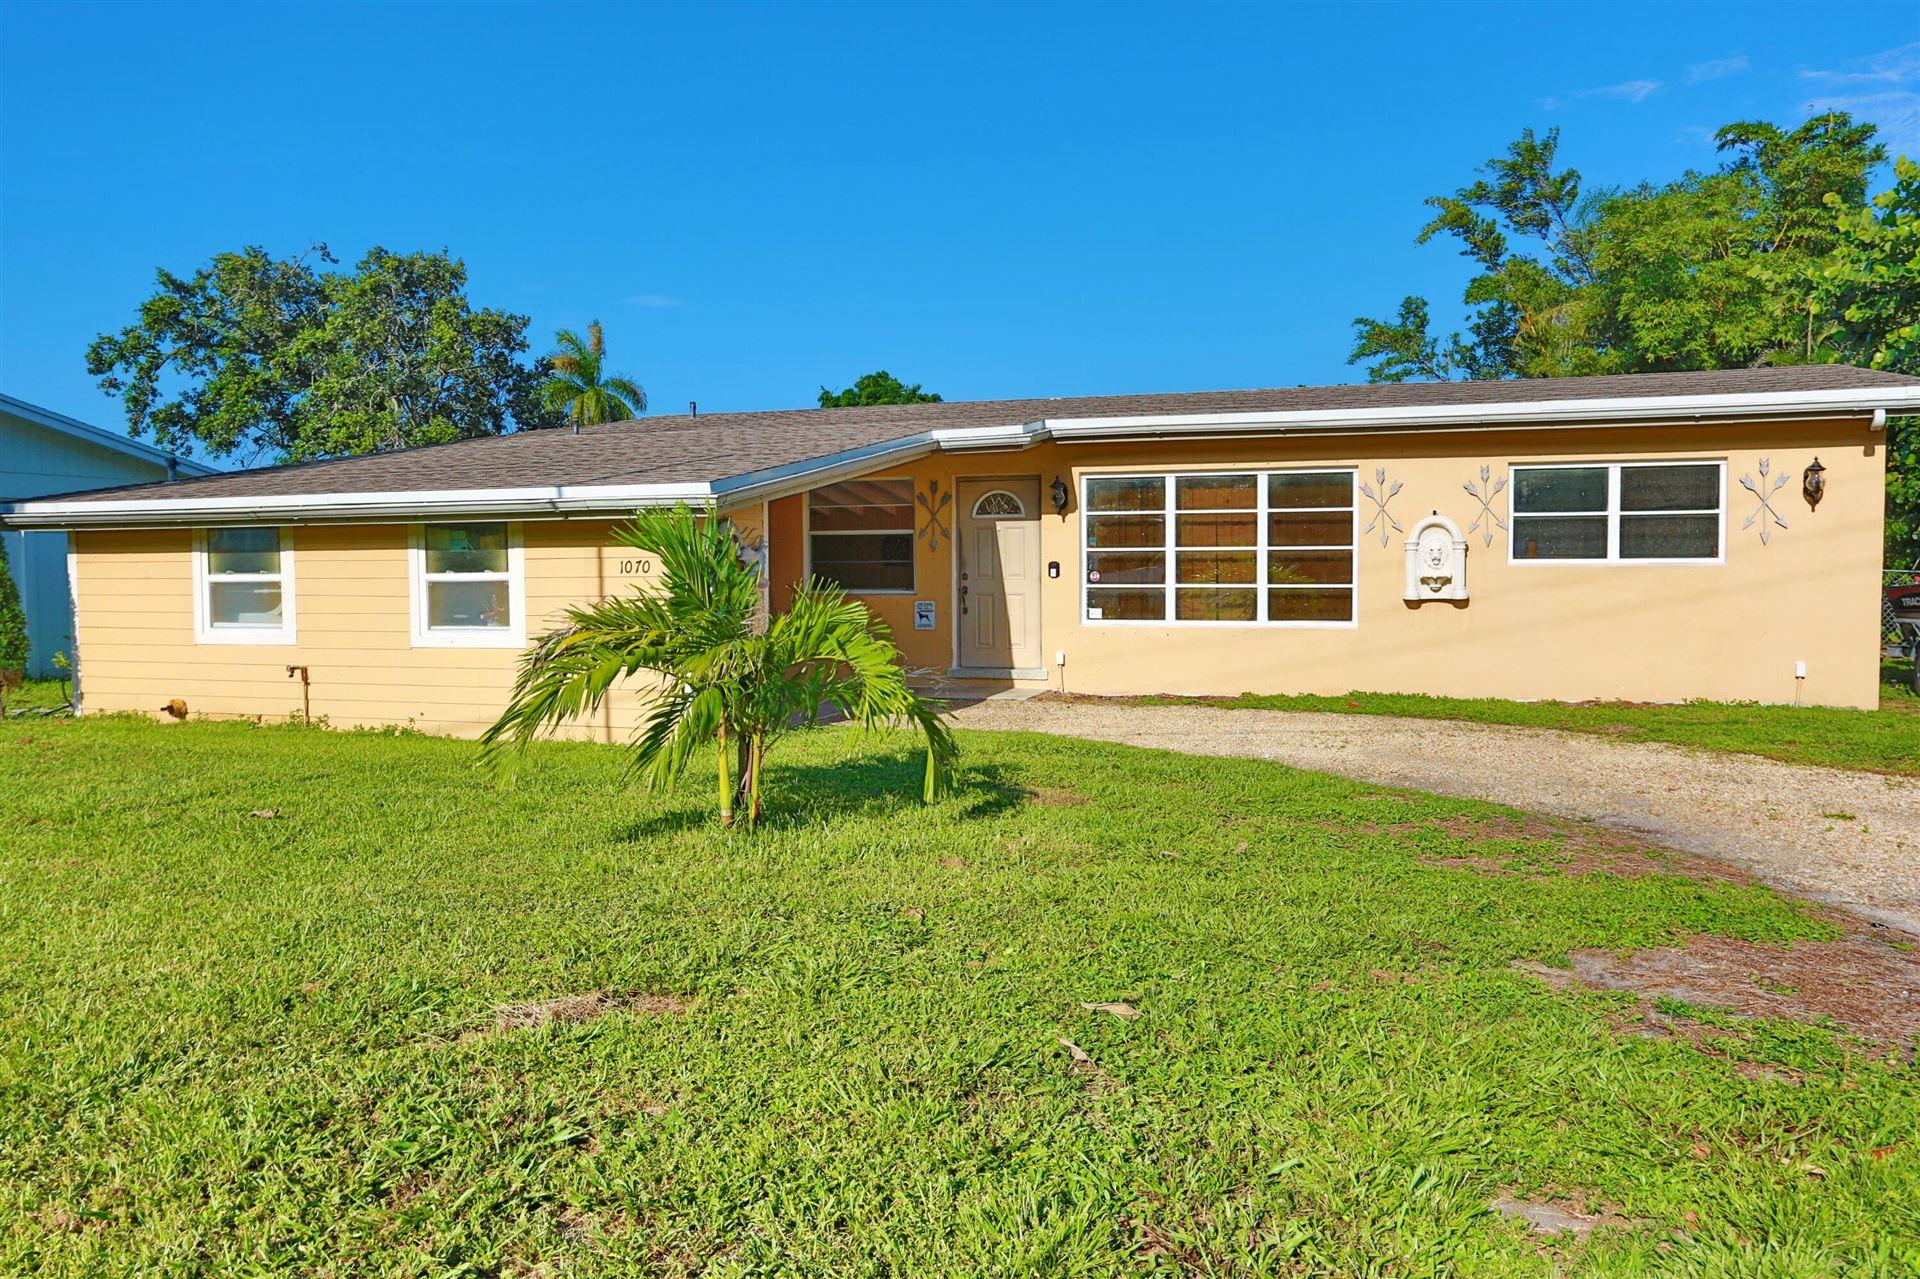 1070 W Shore Drive, West Palm Beach, FL 33406 - #: RX-10745026